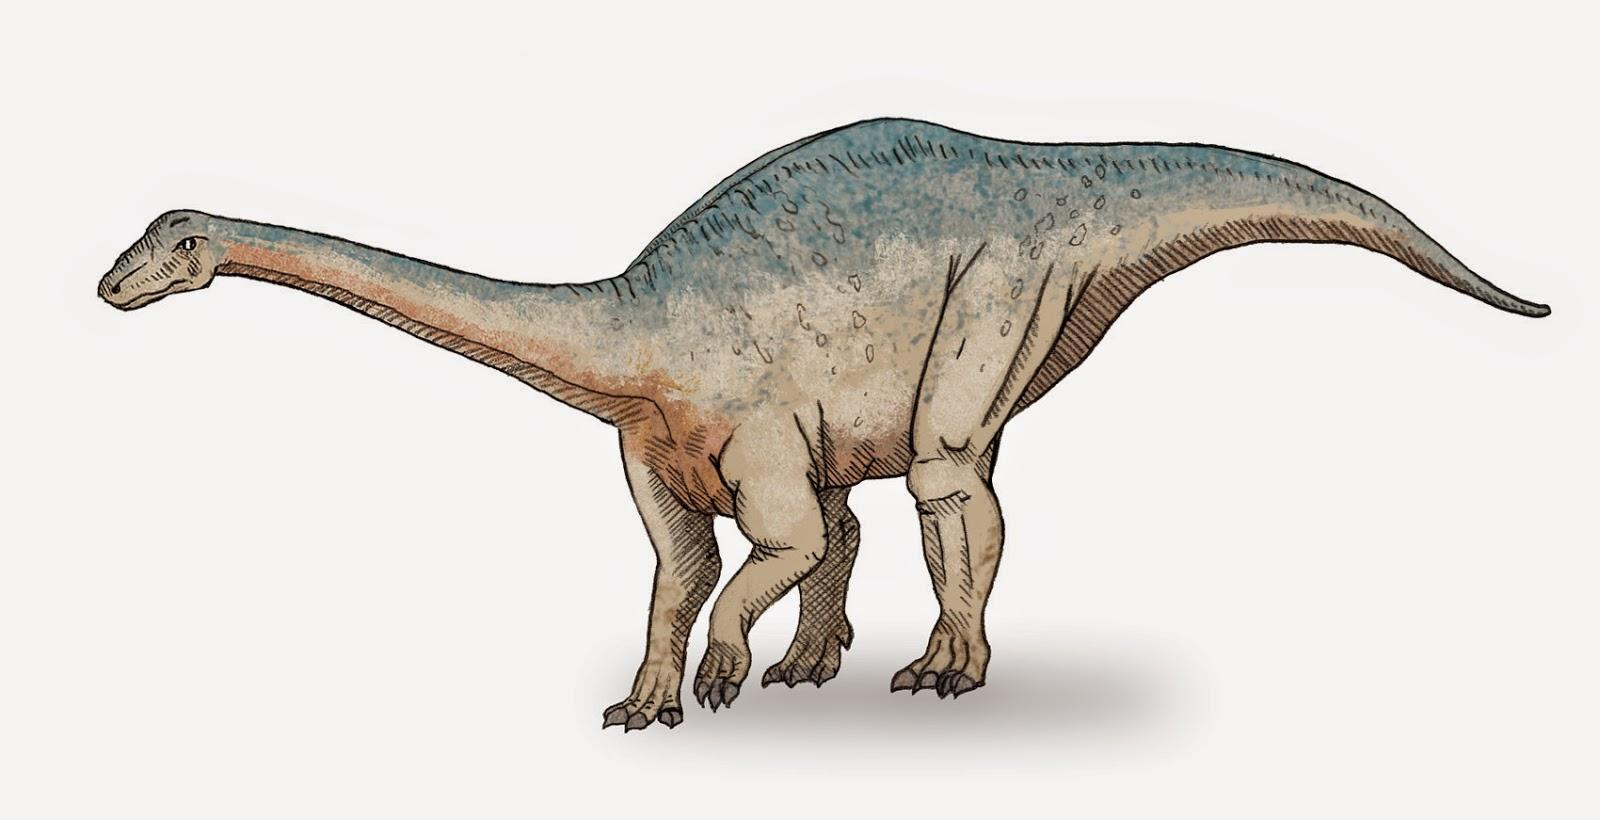 Riojasaurus, Foto: resolviendolaincognita.blogspot.com